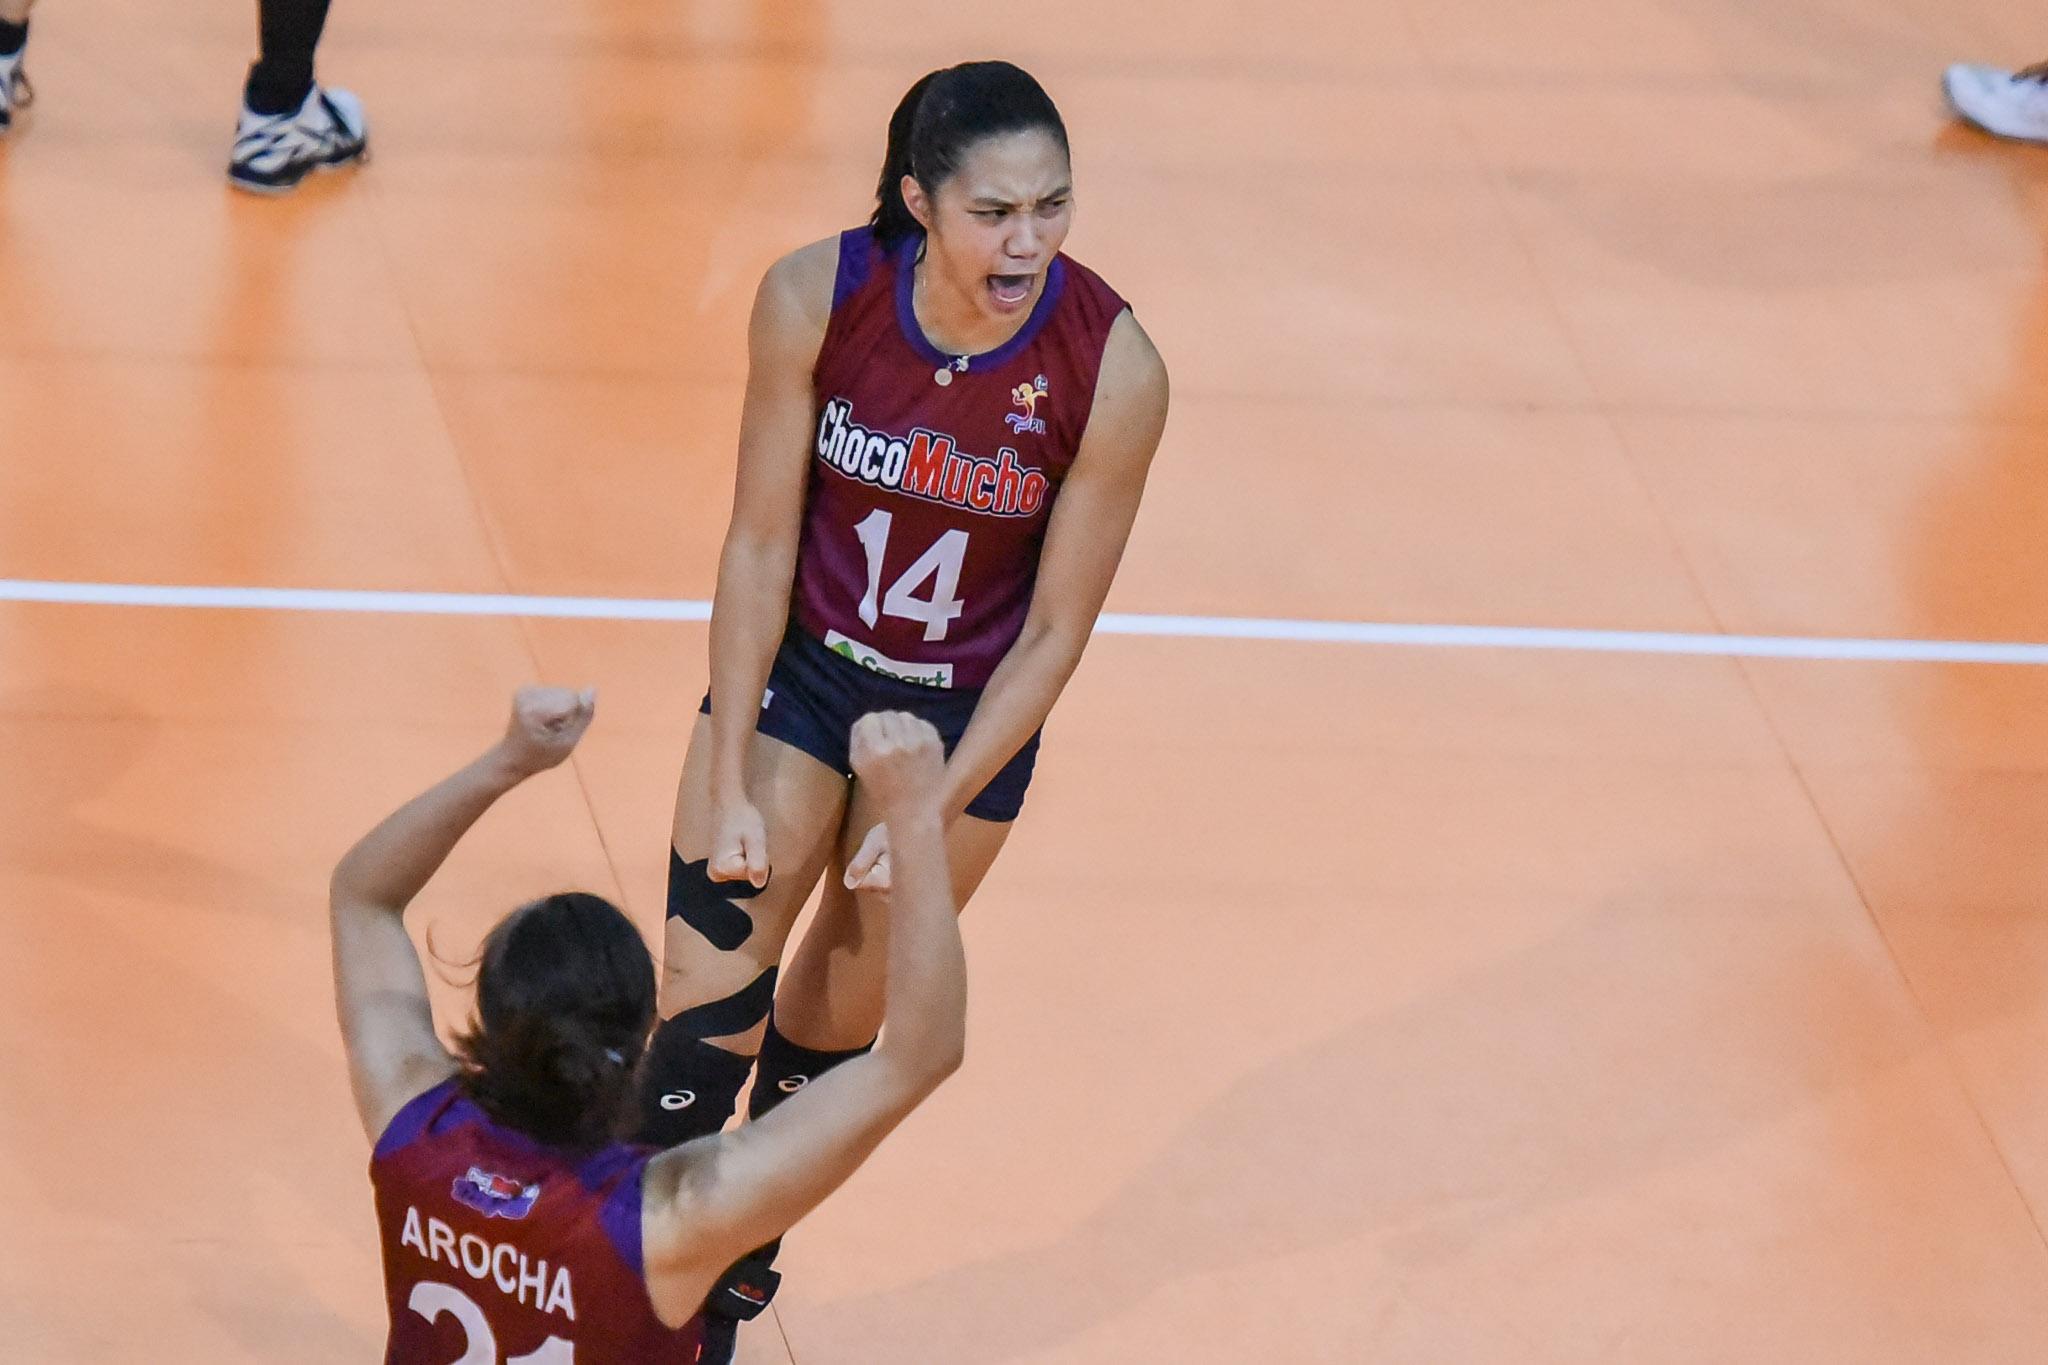 2021-PVL-Open-Creamline-vs.-Choco-Mucho-Bea-De-Leon-7602 Almadro says Choco Mucho lacked 'maturity' in Creamline loss News PVL Volleyball  - philippine sports news